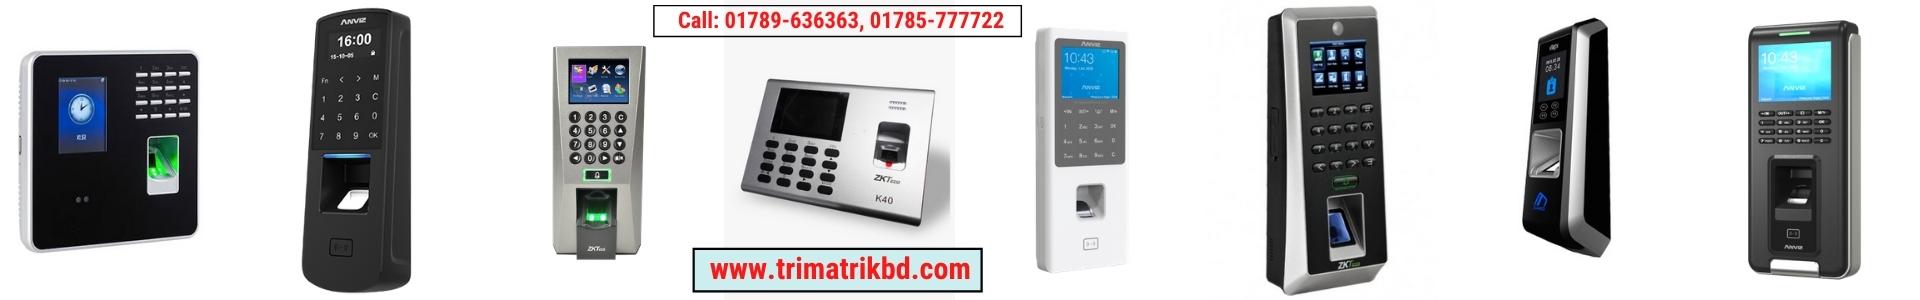 Fingerprint attendance machine price in Bangladesh